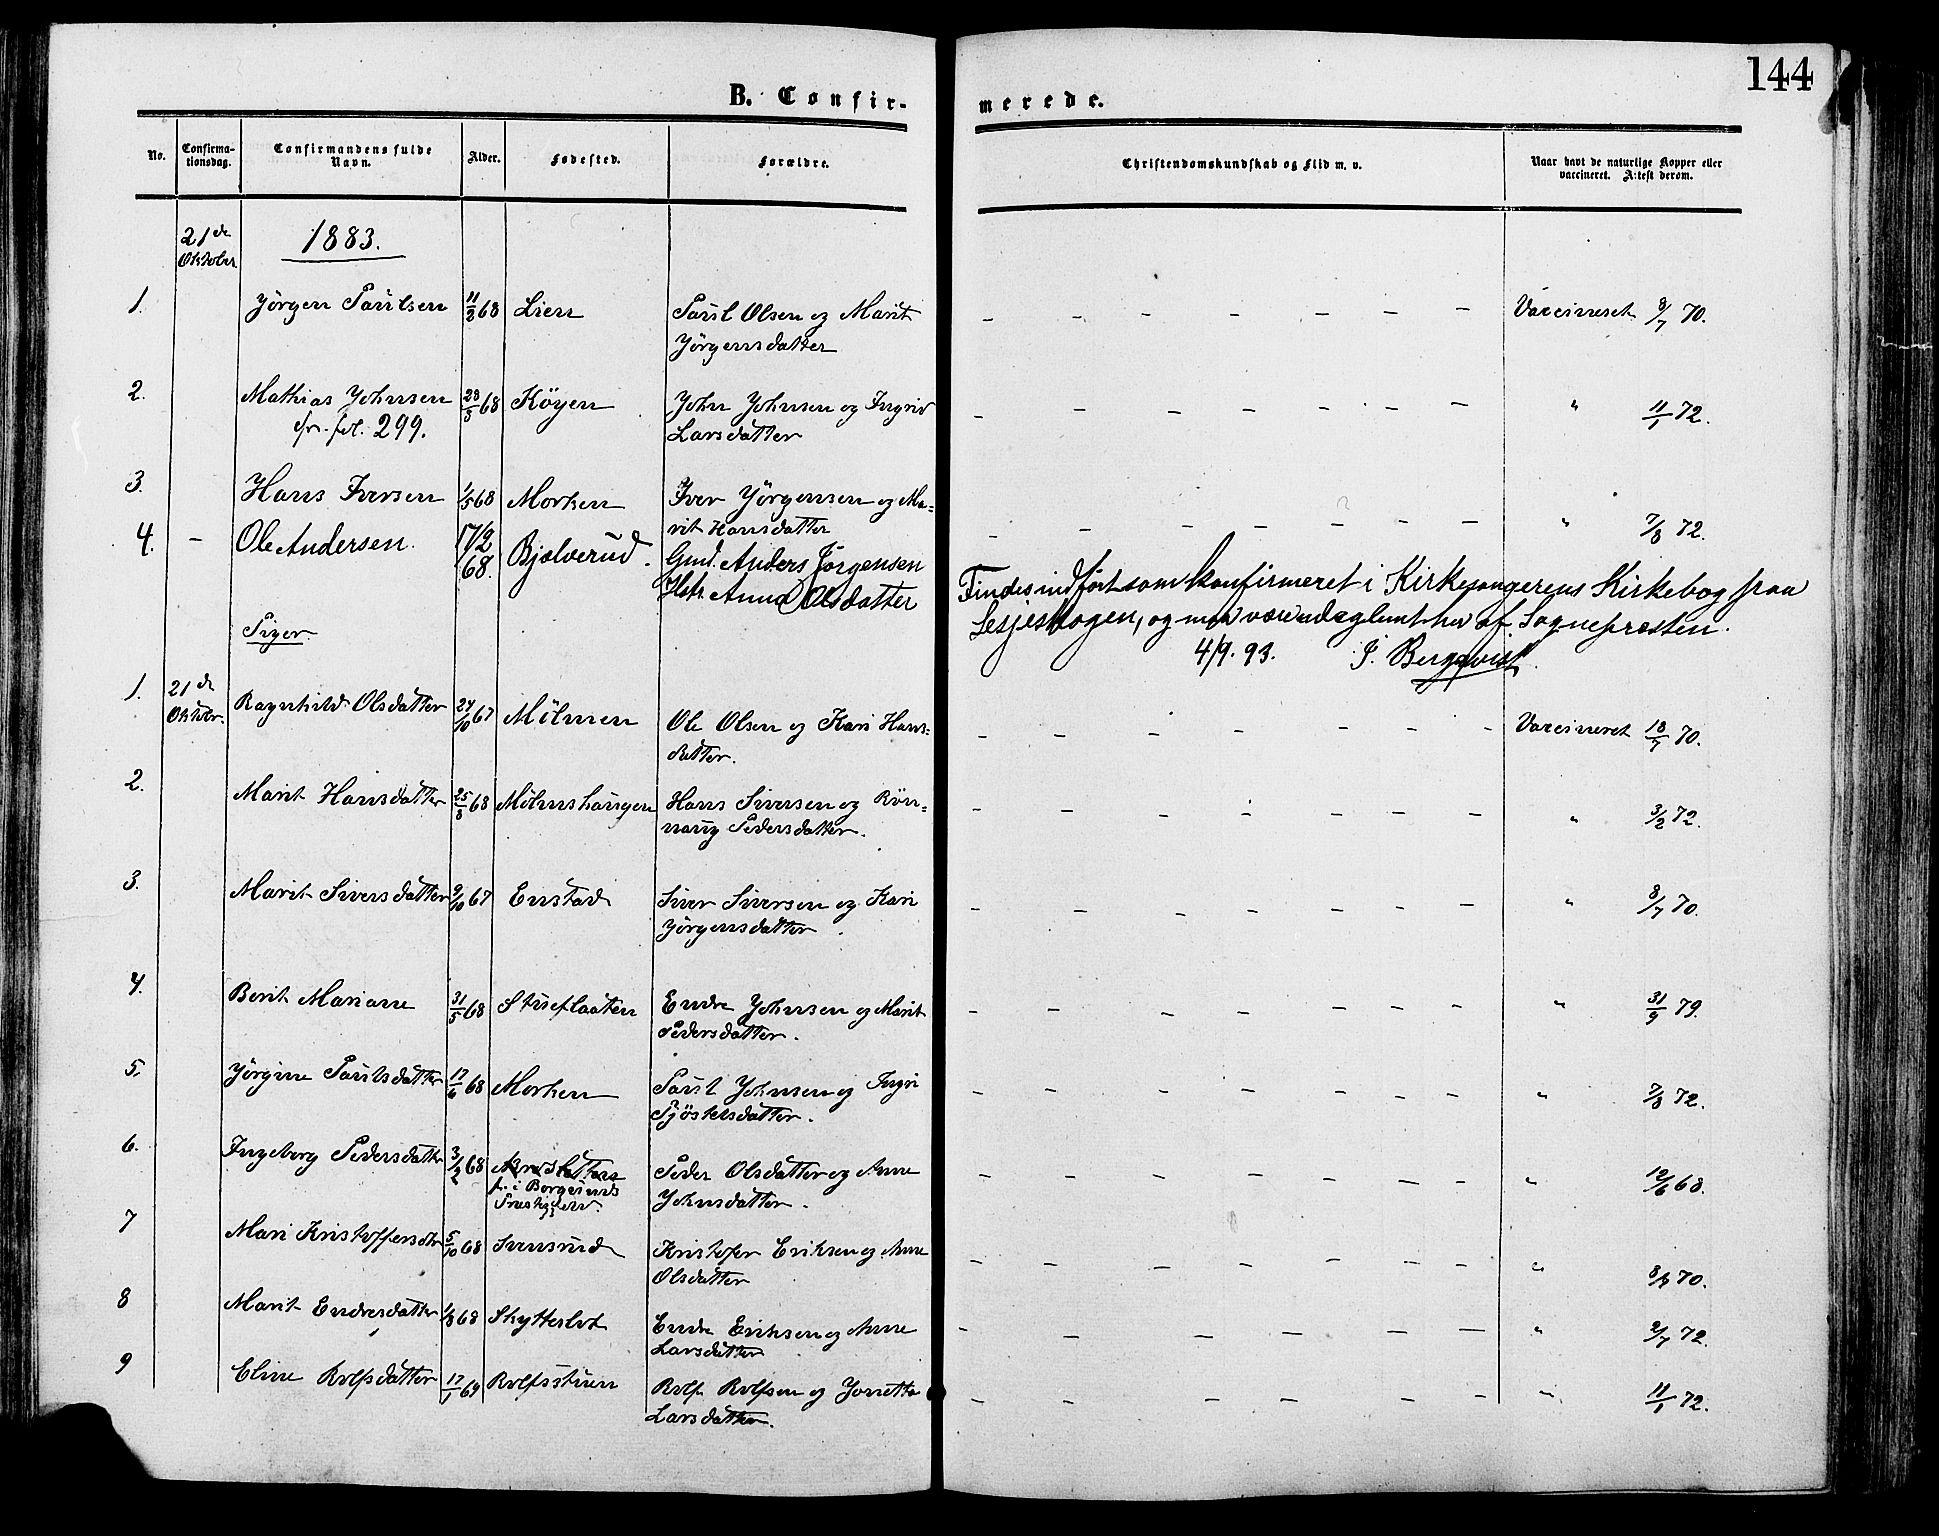 SAH, Lesja prestekontor, Ministerialbok nr. 9, 1854-1889, s. 144